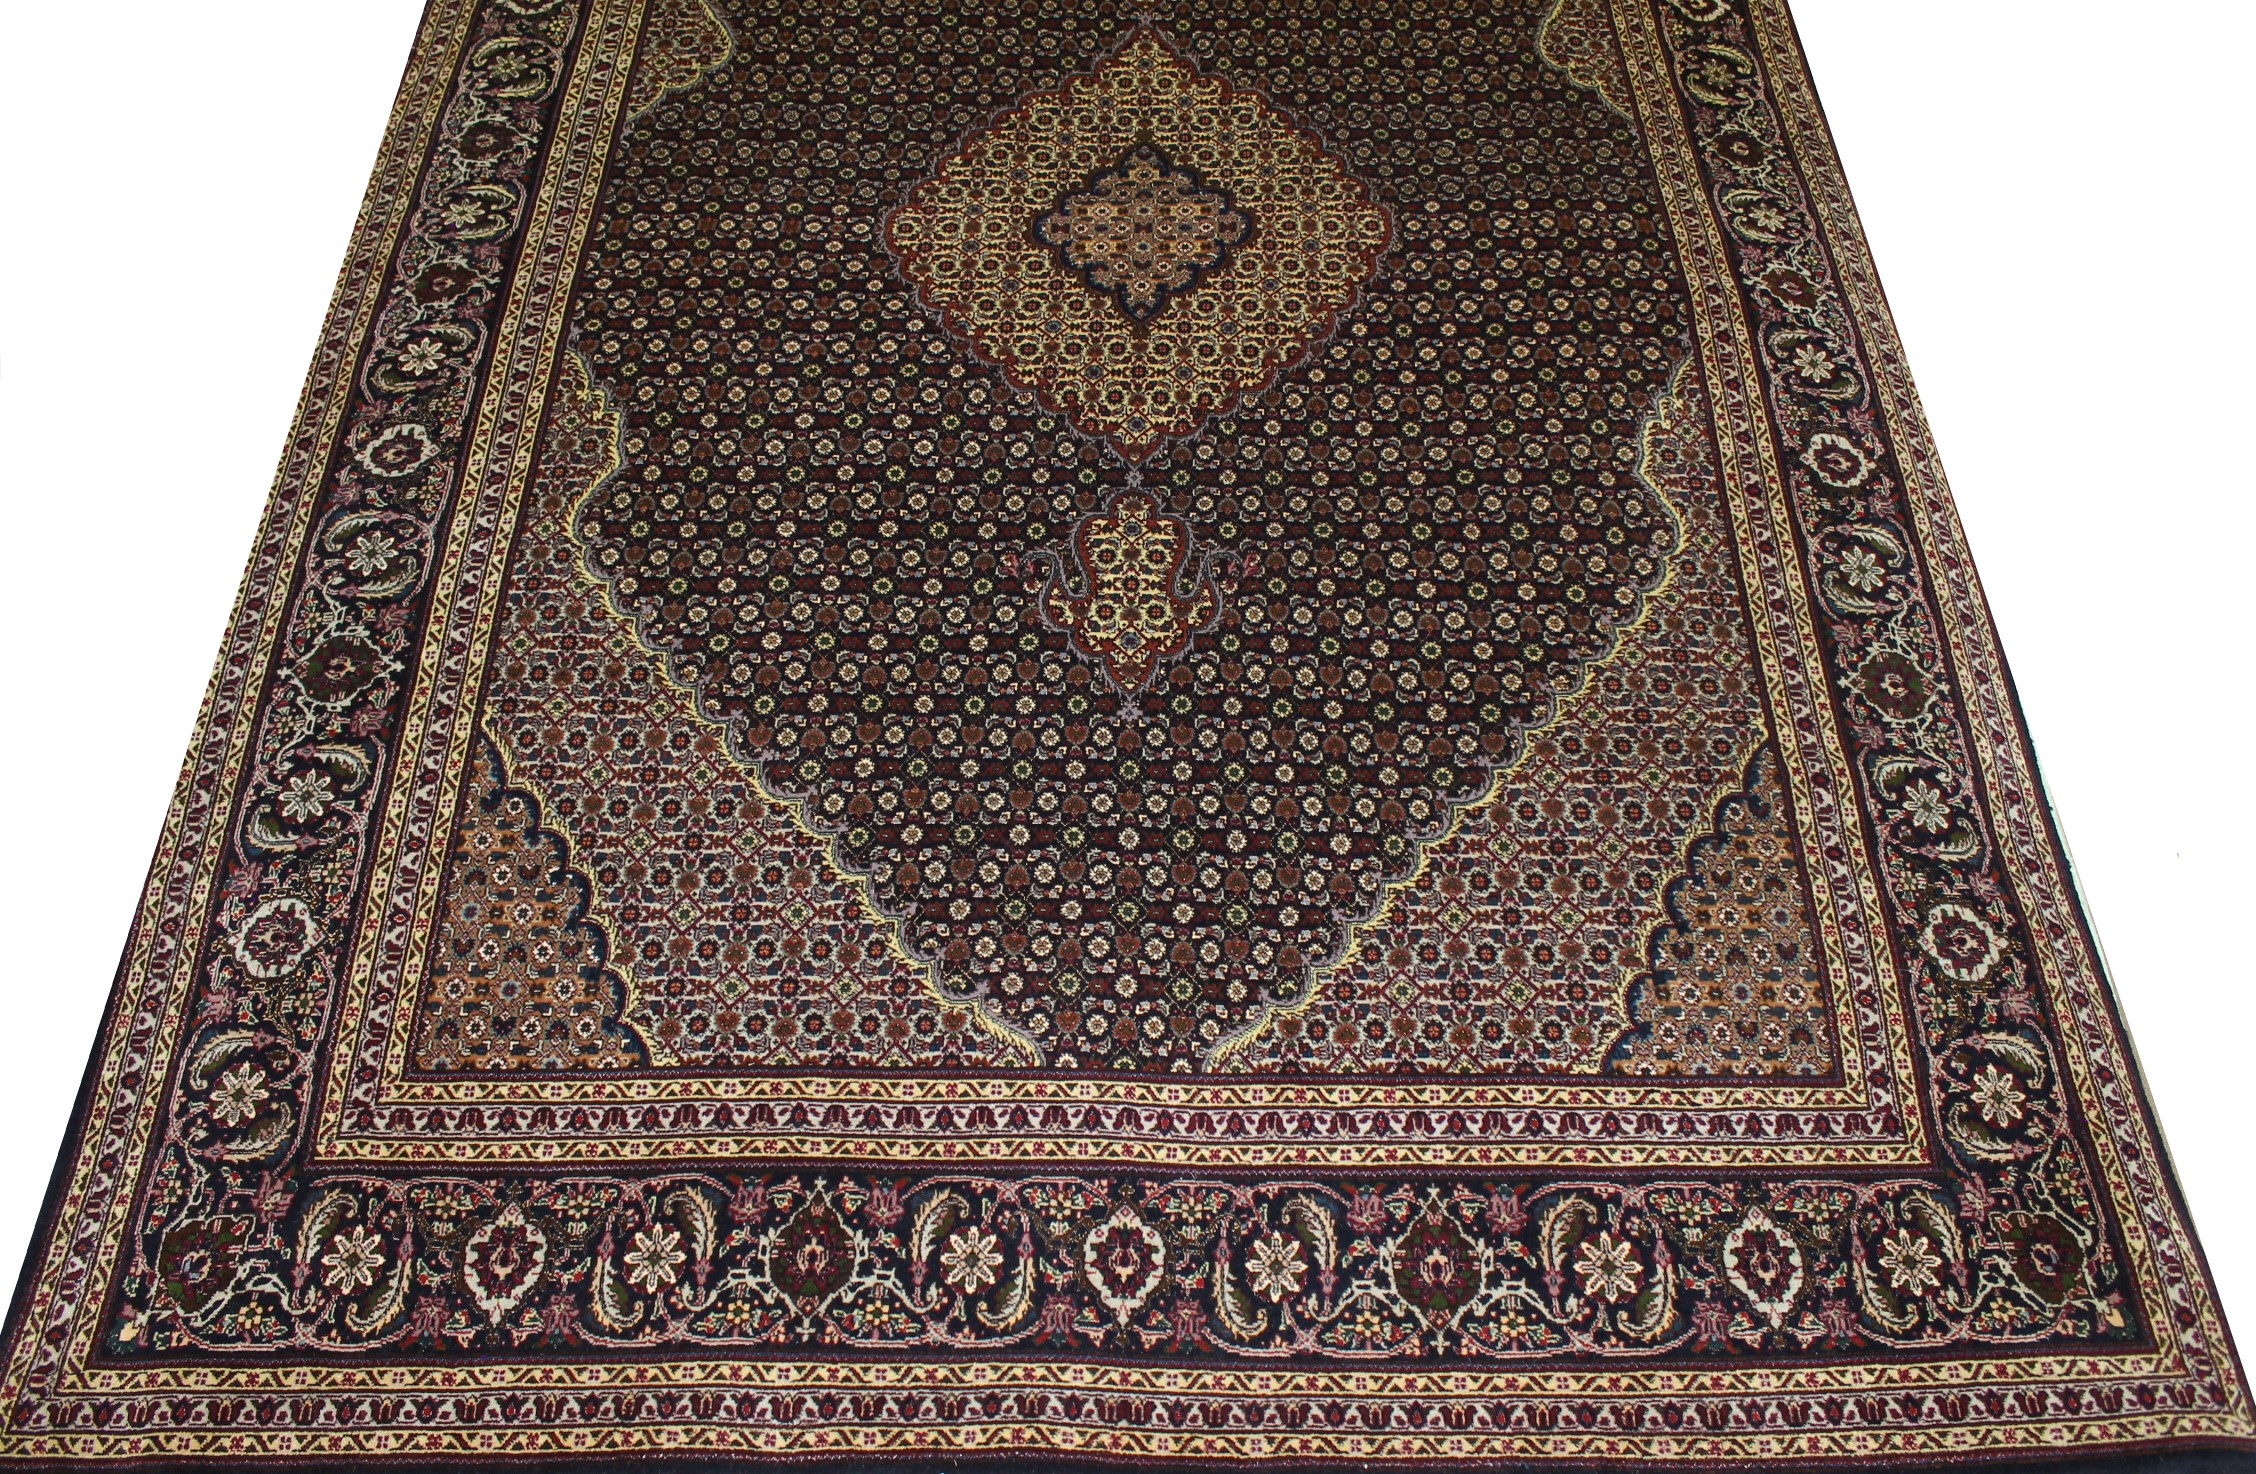 8x10 Heriz/Serapi Hand Knotted Wool & Silk Area Rug - MR023151